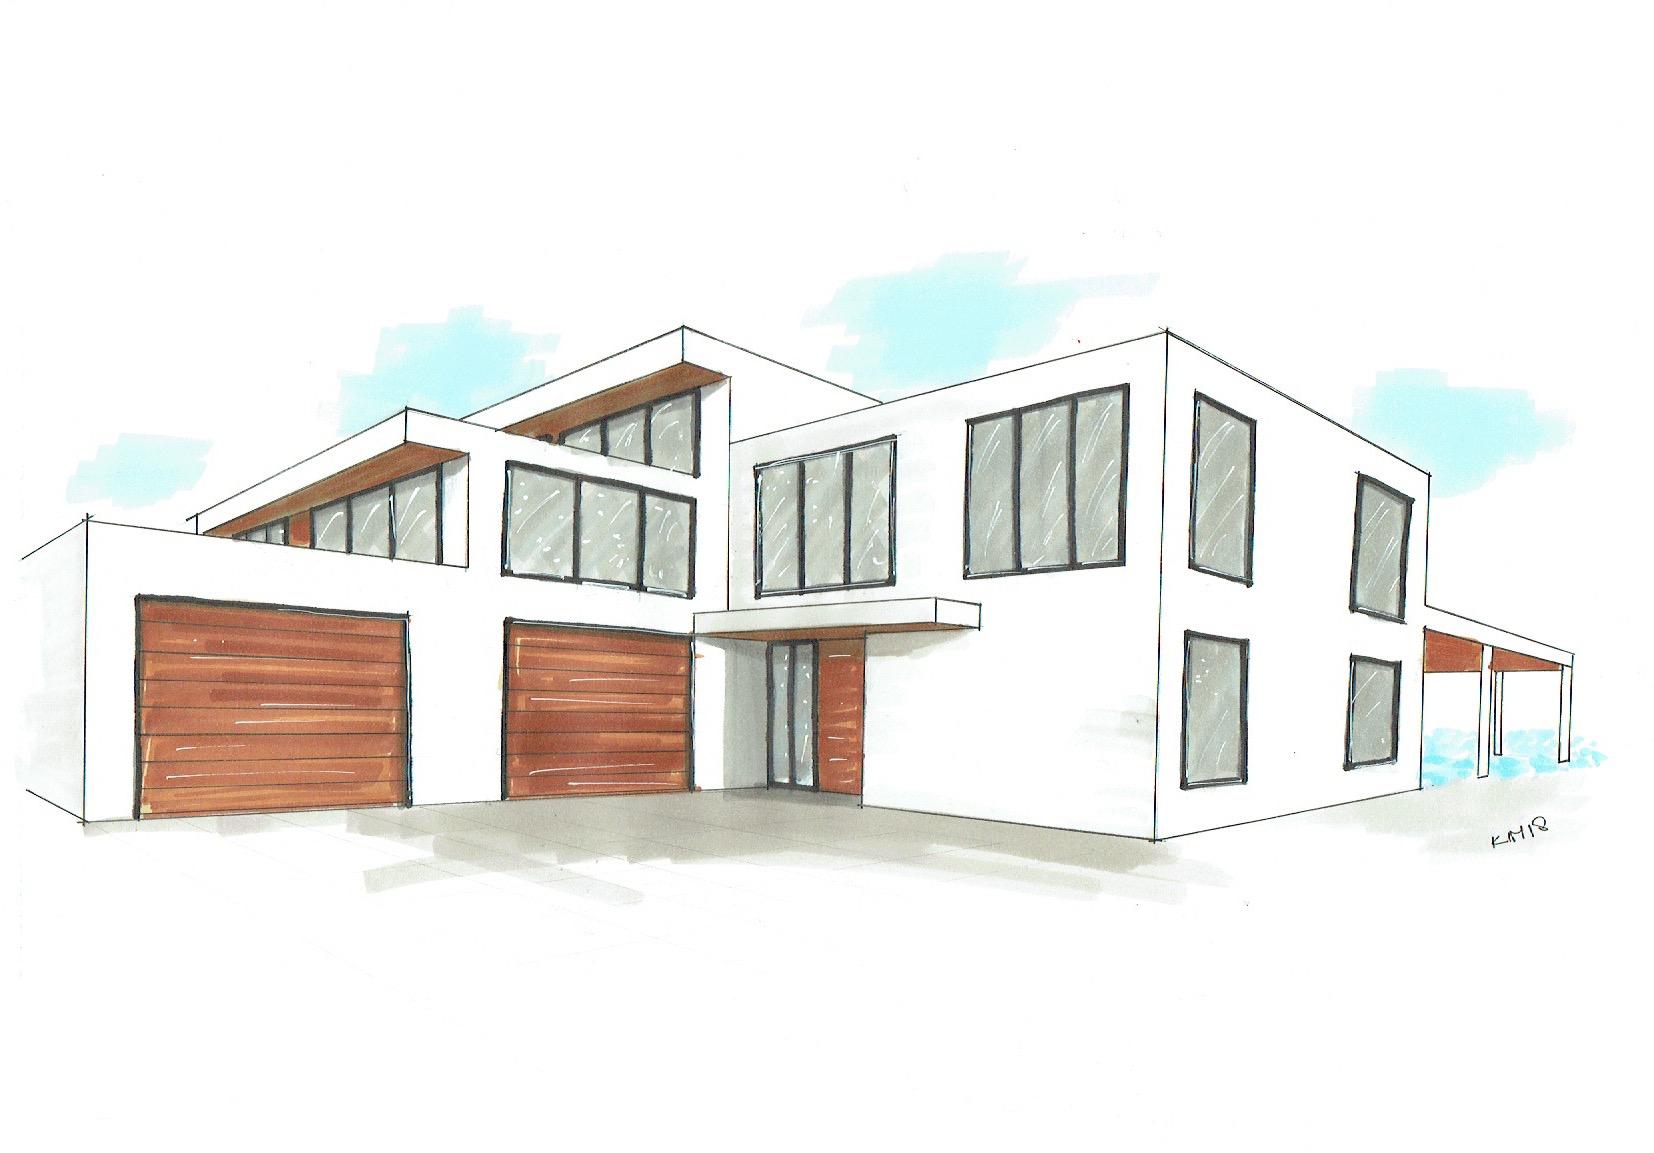 Sketch villa garages